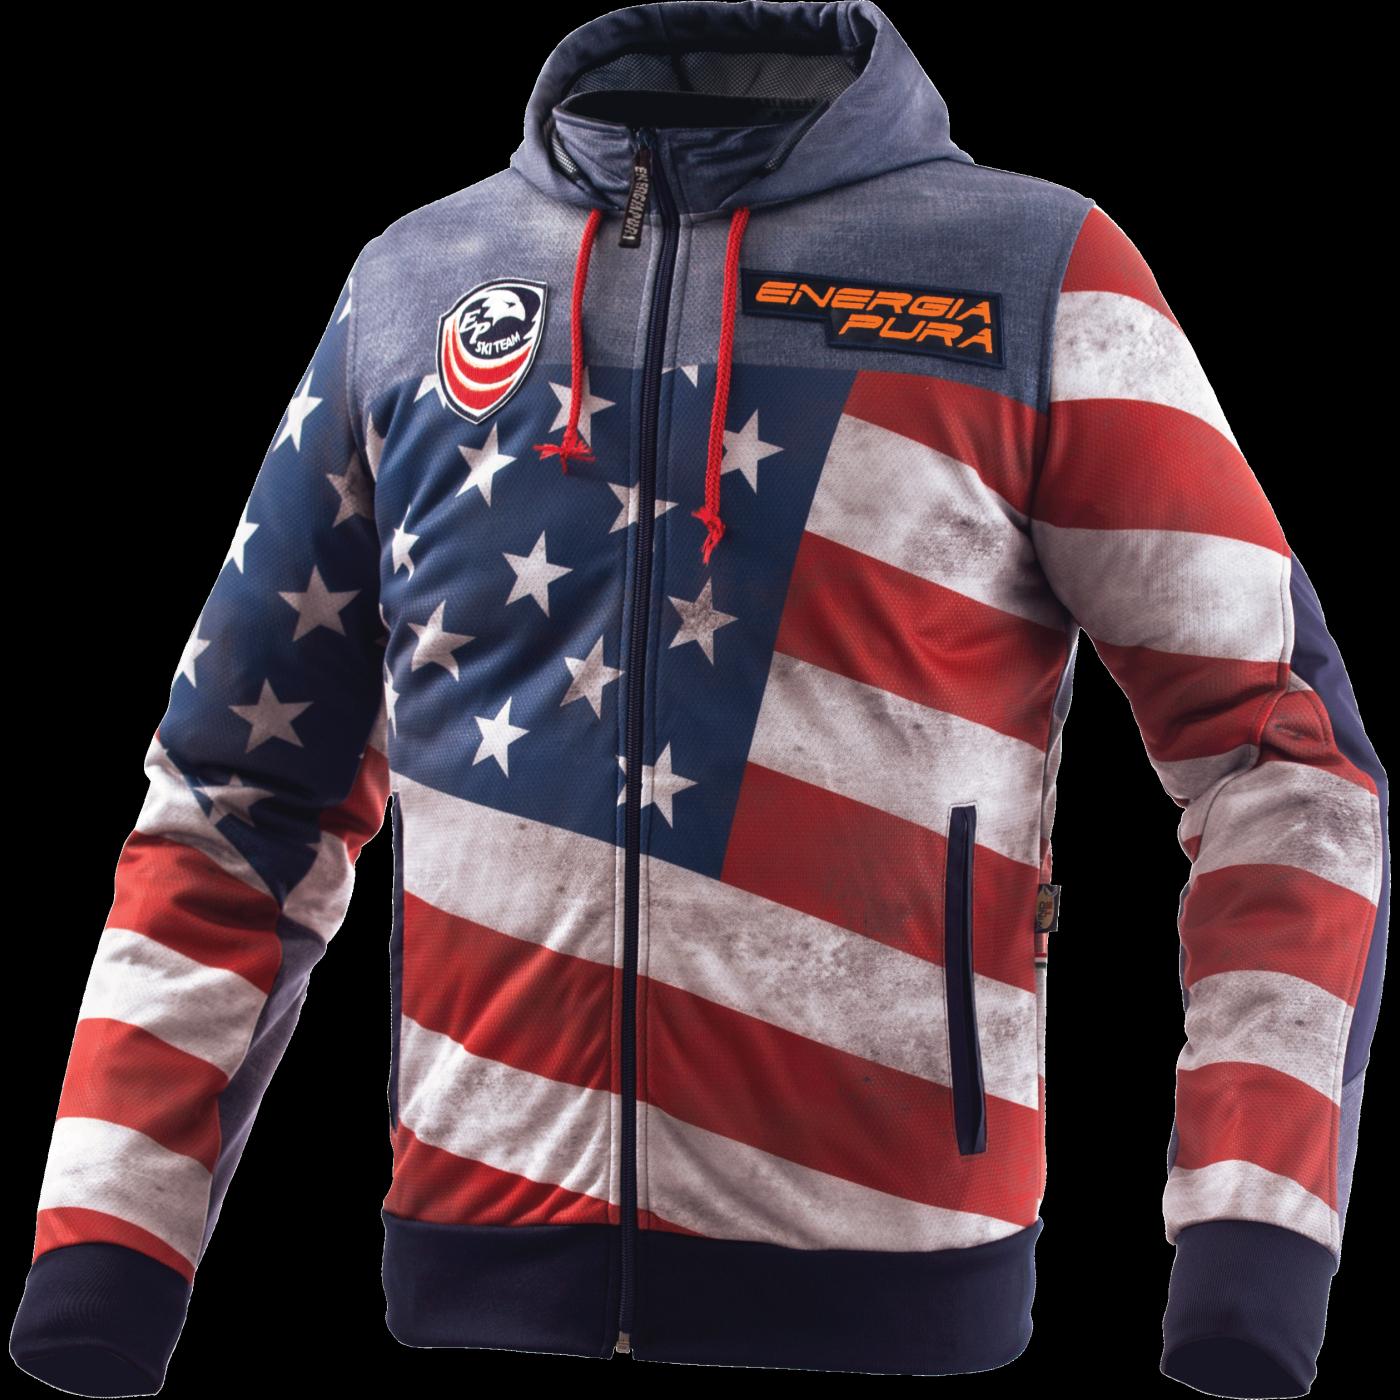 Junior America Energiapura Veste Flag Light Jacket oCEQxWerdB